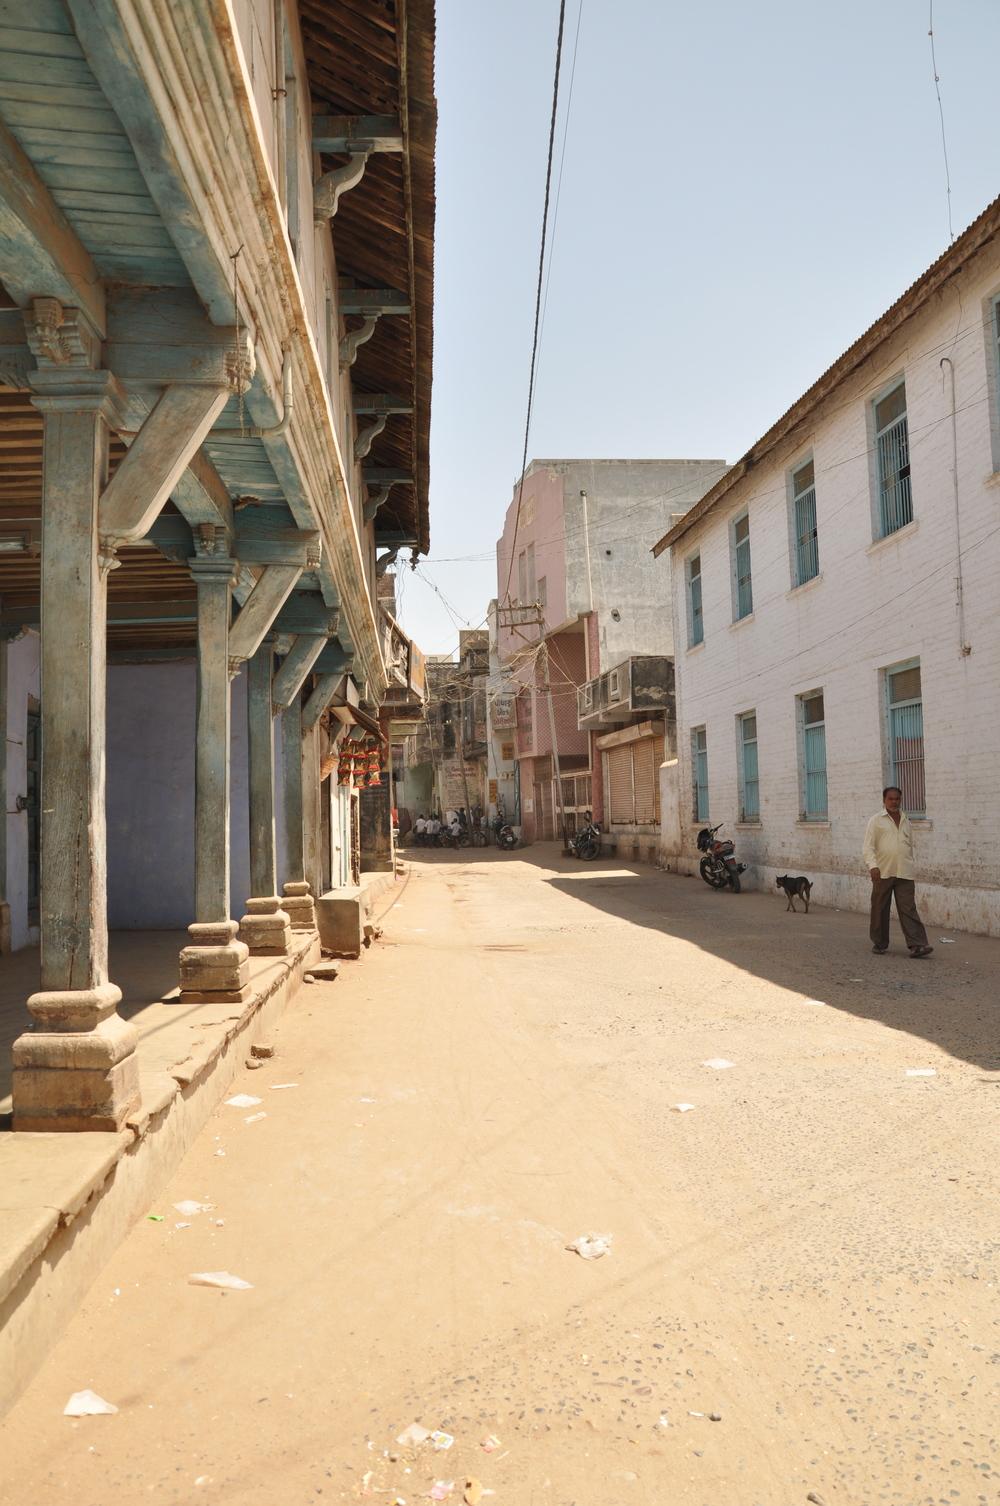 Boriavi: The village I focussed my research at